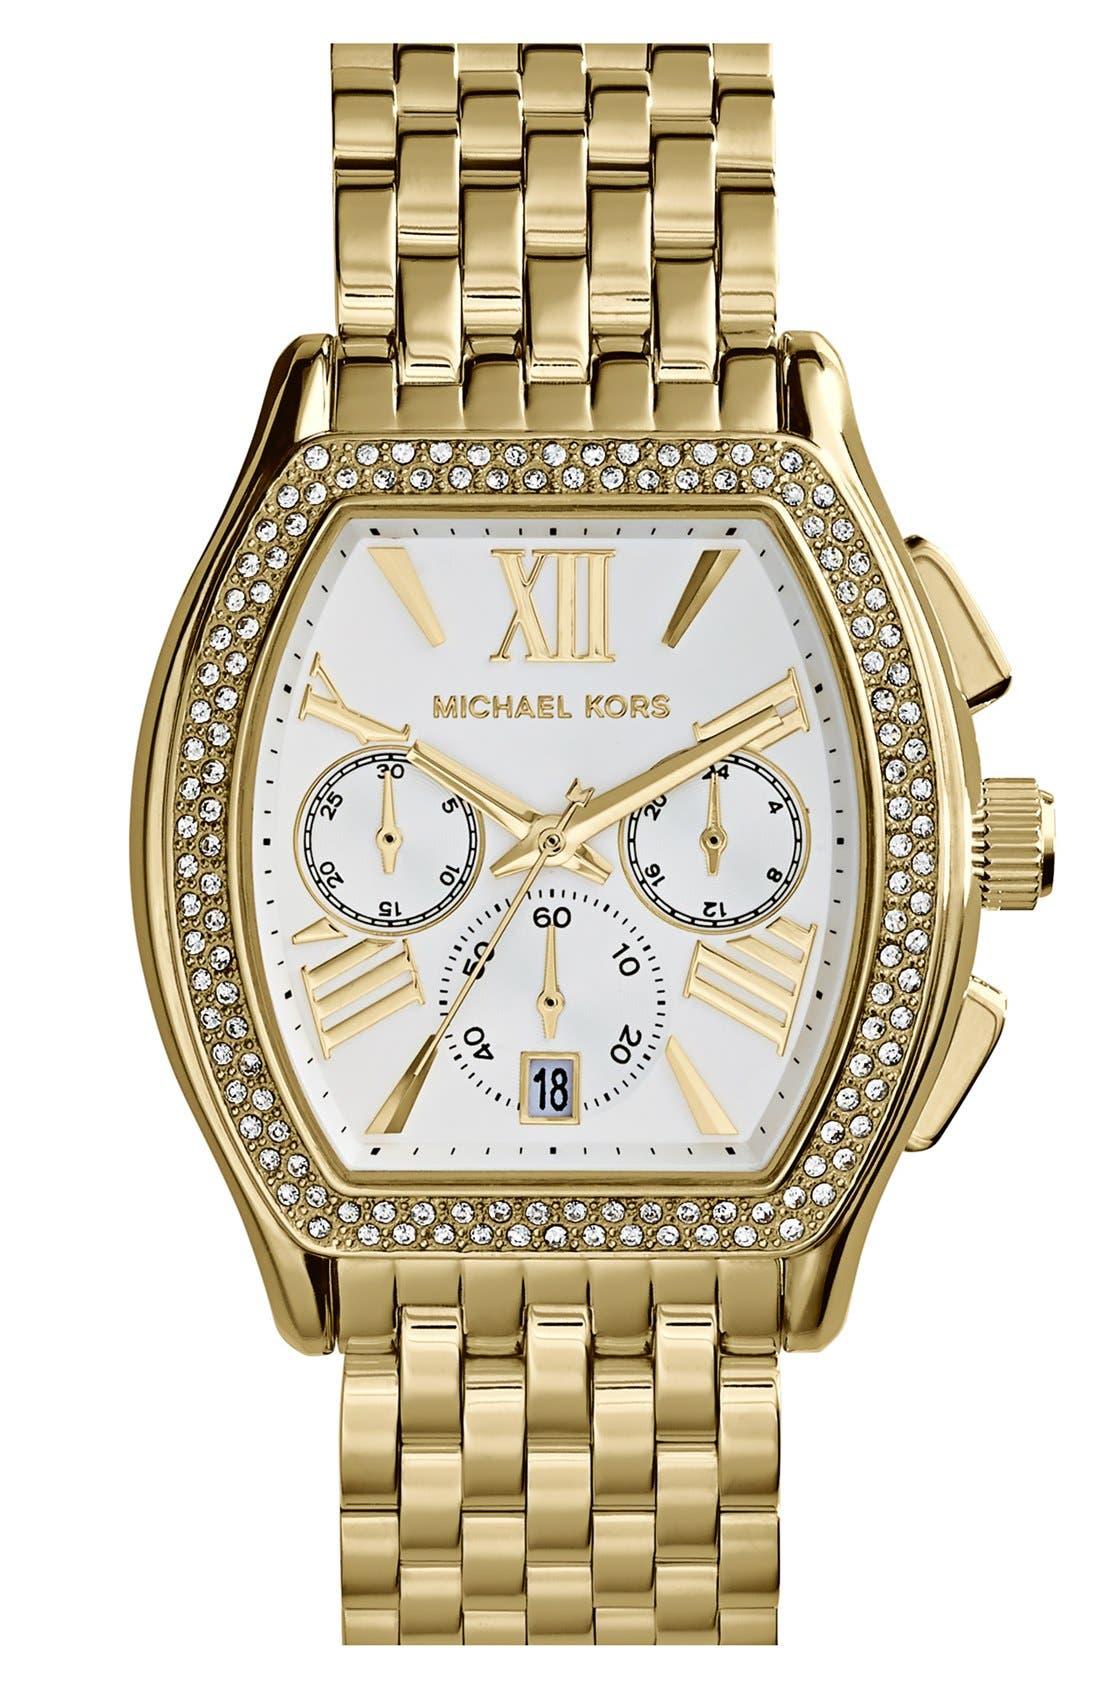 Main Image - Michael Kors 'Amherst' Crystal Bezel Chronograph Bracelet Watch, 38mm